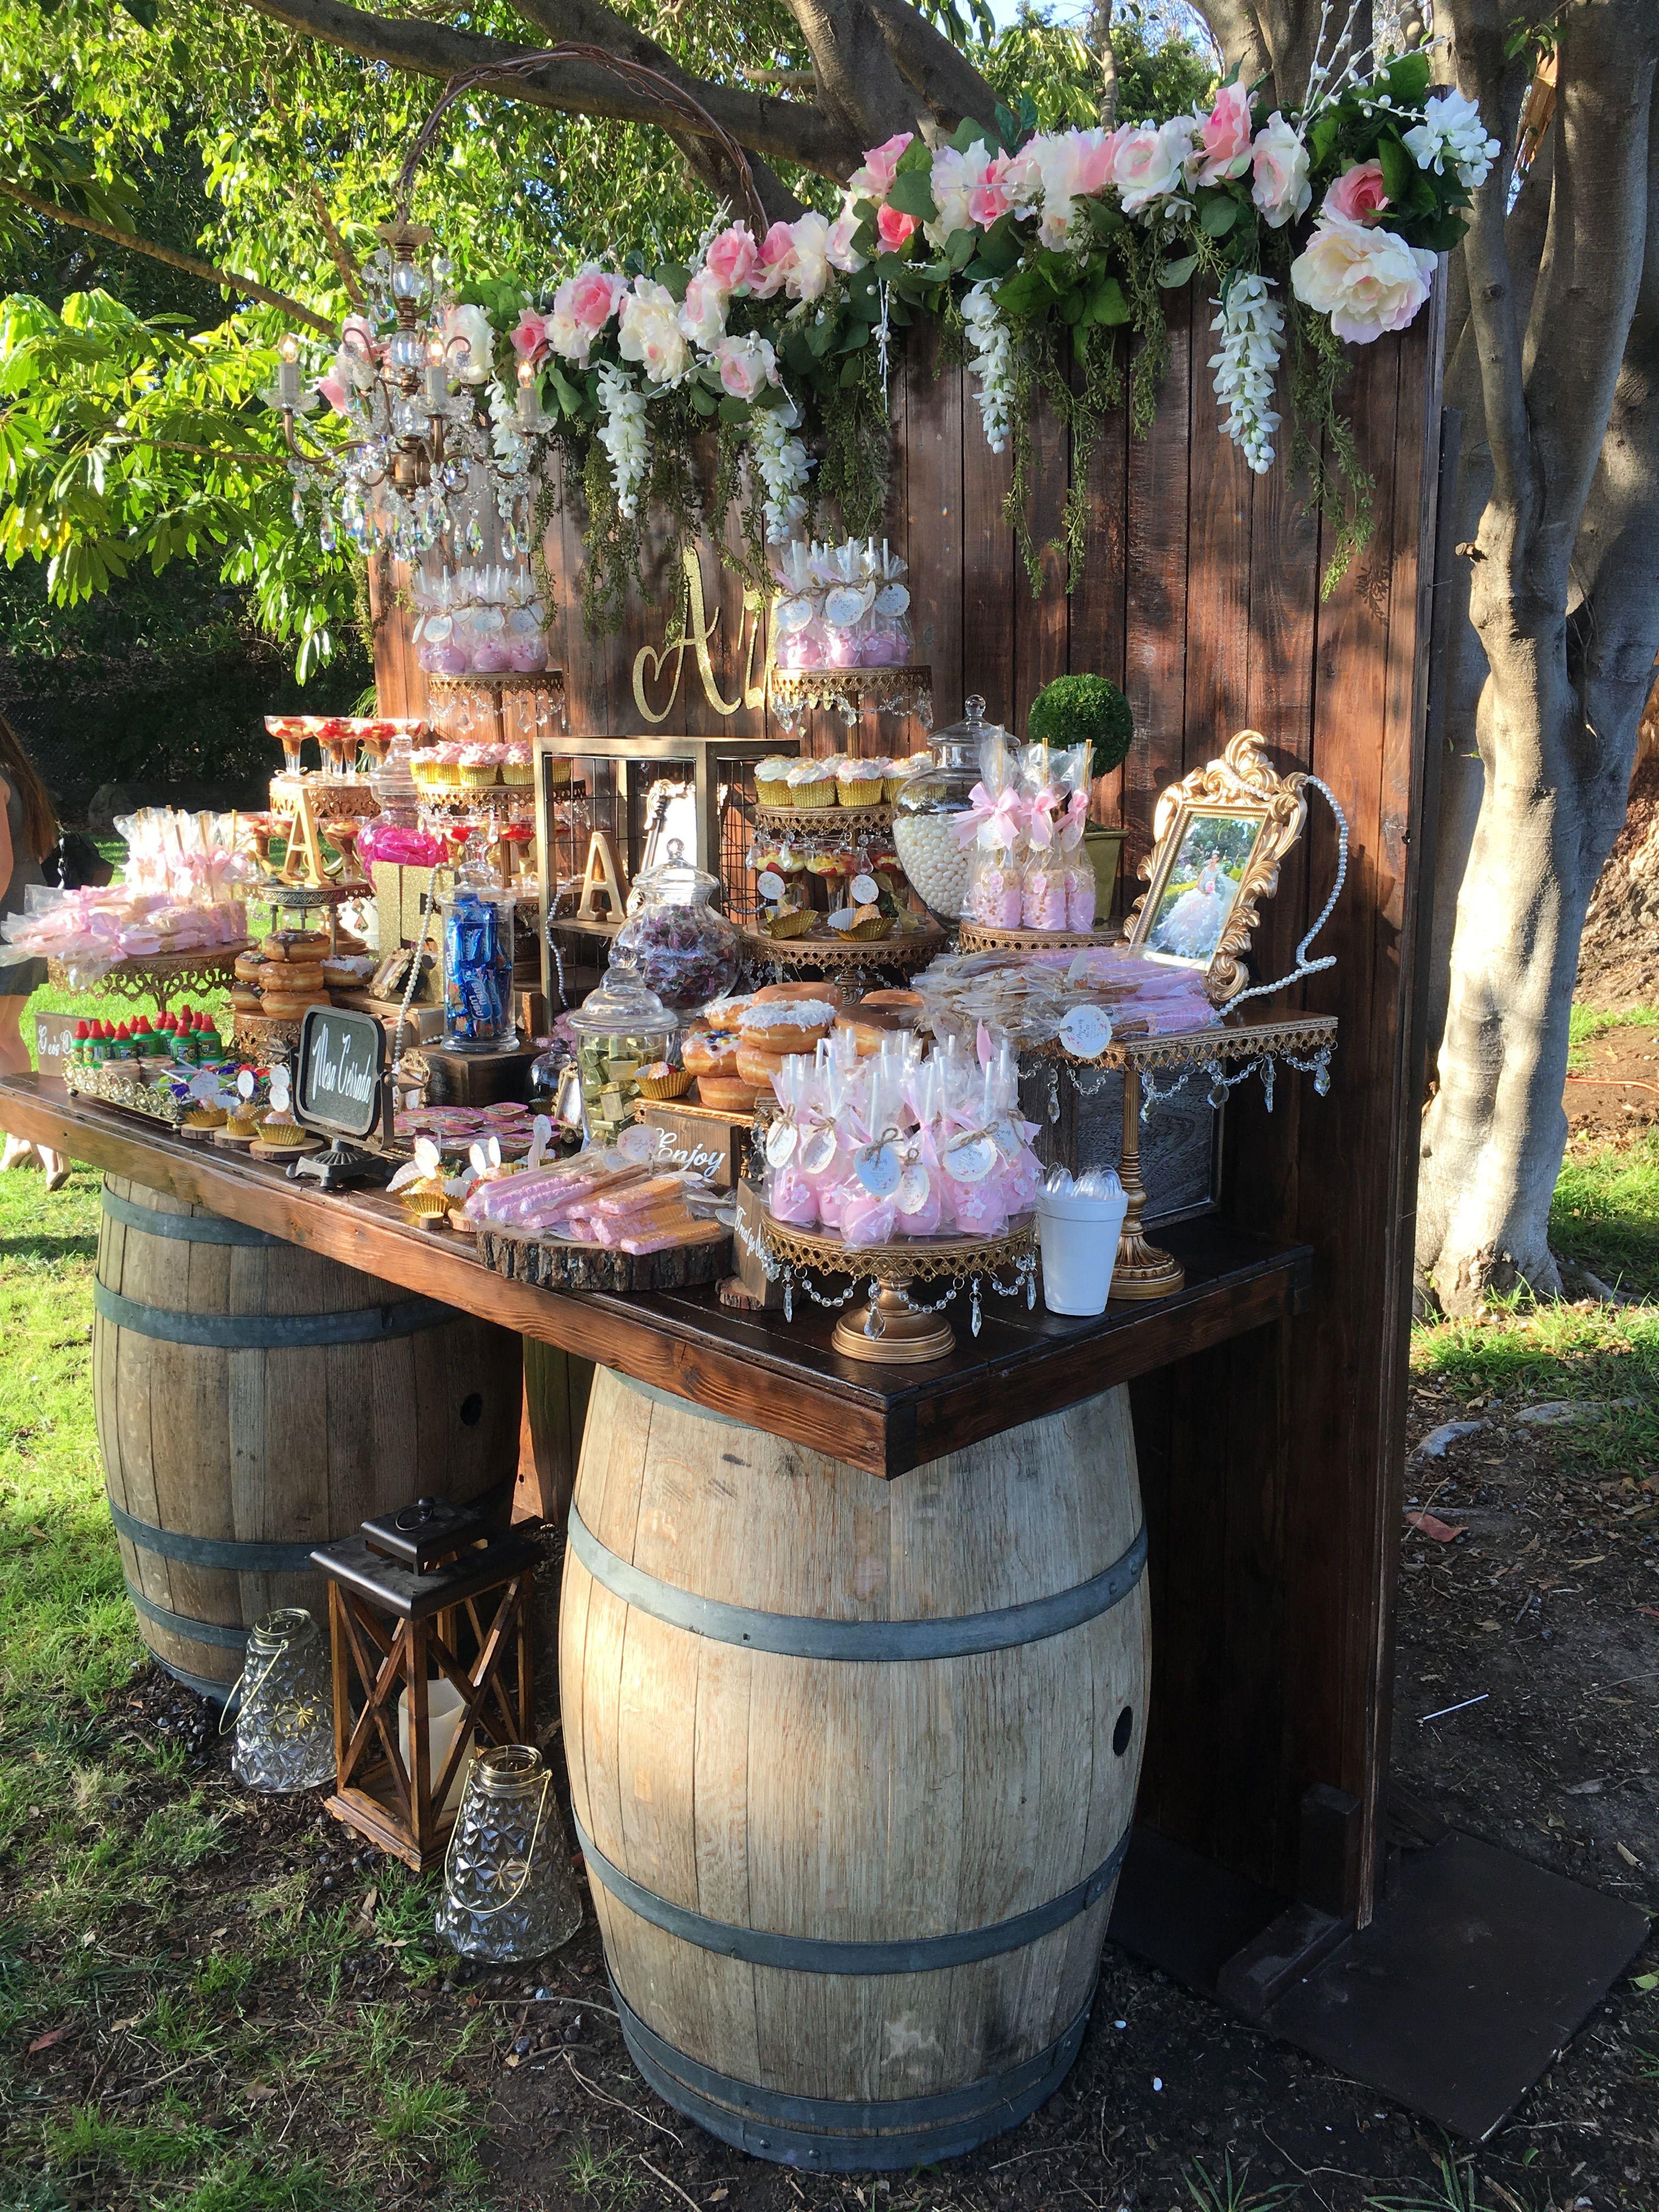 Wood Backdrop Gold Stands Barrel Table Rustic Fall Wedding Rustic Quinceanera Quinceanera Decorations